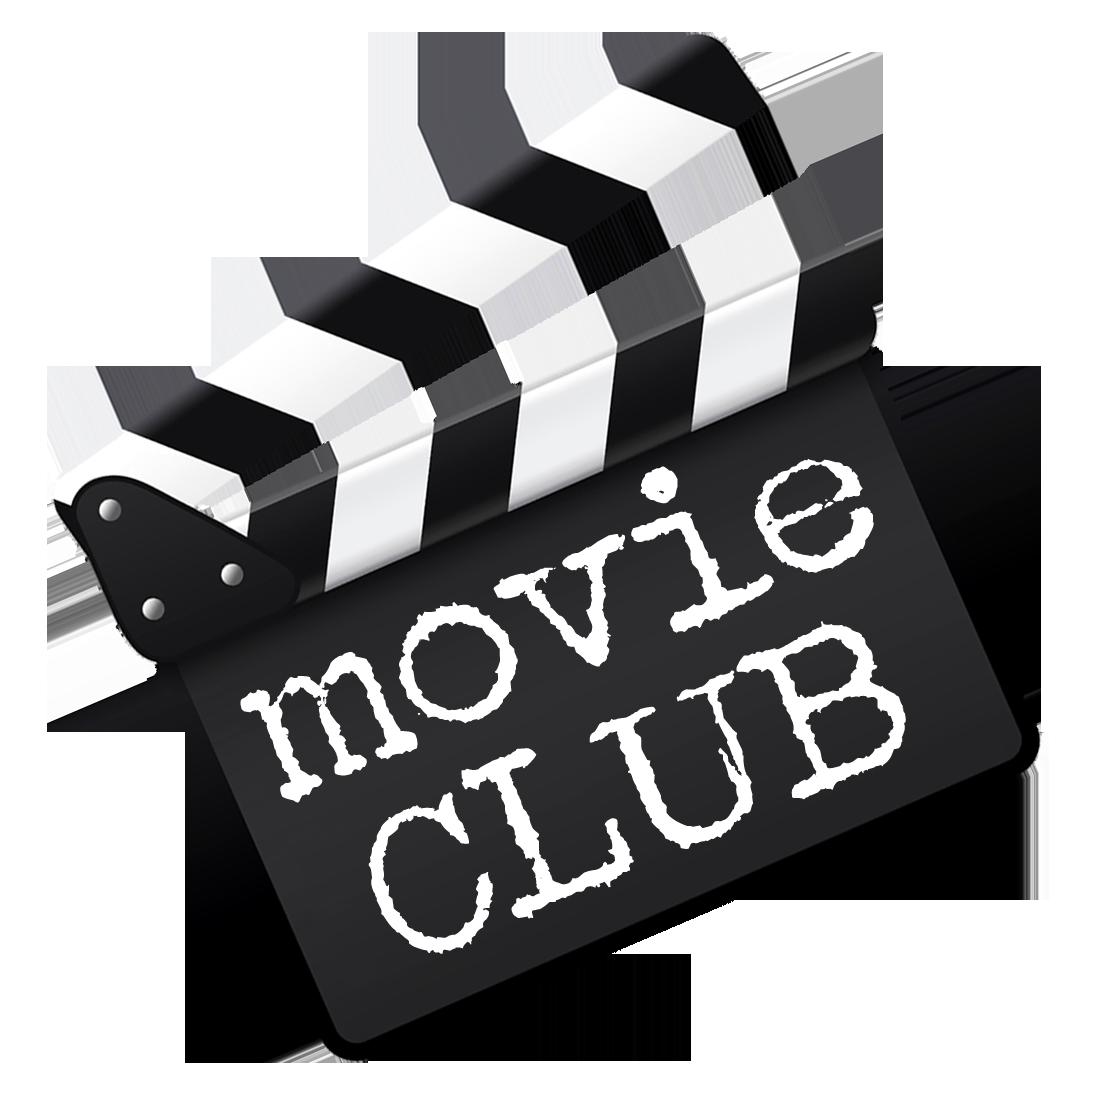 TOP MOVIE NETWORKS - CINEMAX - (THRILLER , STARMAX , ACTION MAX , 5 STAR MAX)HBO - (SIGNATURE , COMEDY , FAMILY , ZONE , PLUTO , EAST , HBO 2)SHOWTIME , STARZ , EPIX , EPIX 2 , SONY MOVIE , FX MOVIES , FXM , FOX PREMIUM , FXX , FOX , A1 CINEMA